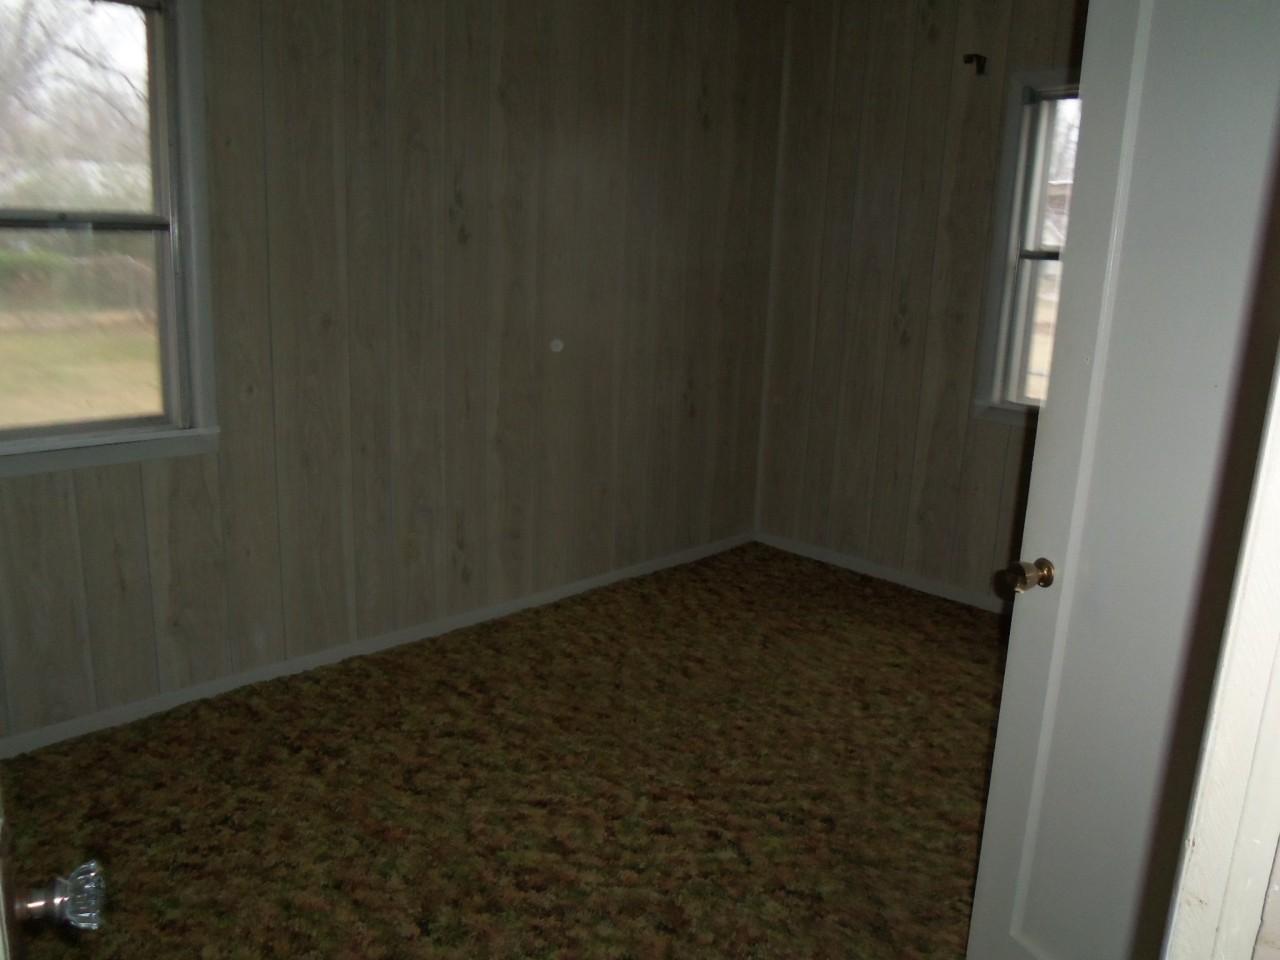 Closed | 2308 B Street Miami, OK 74354 1